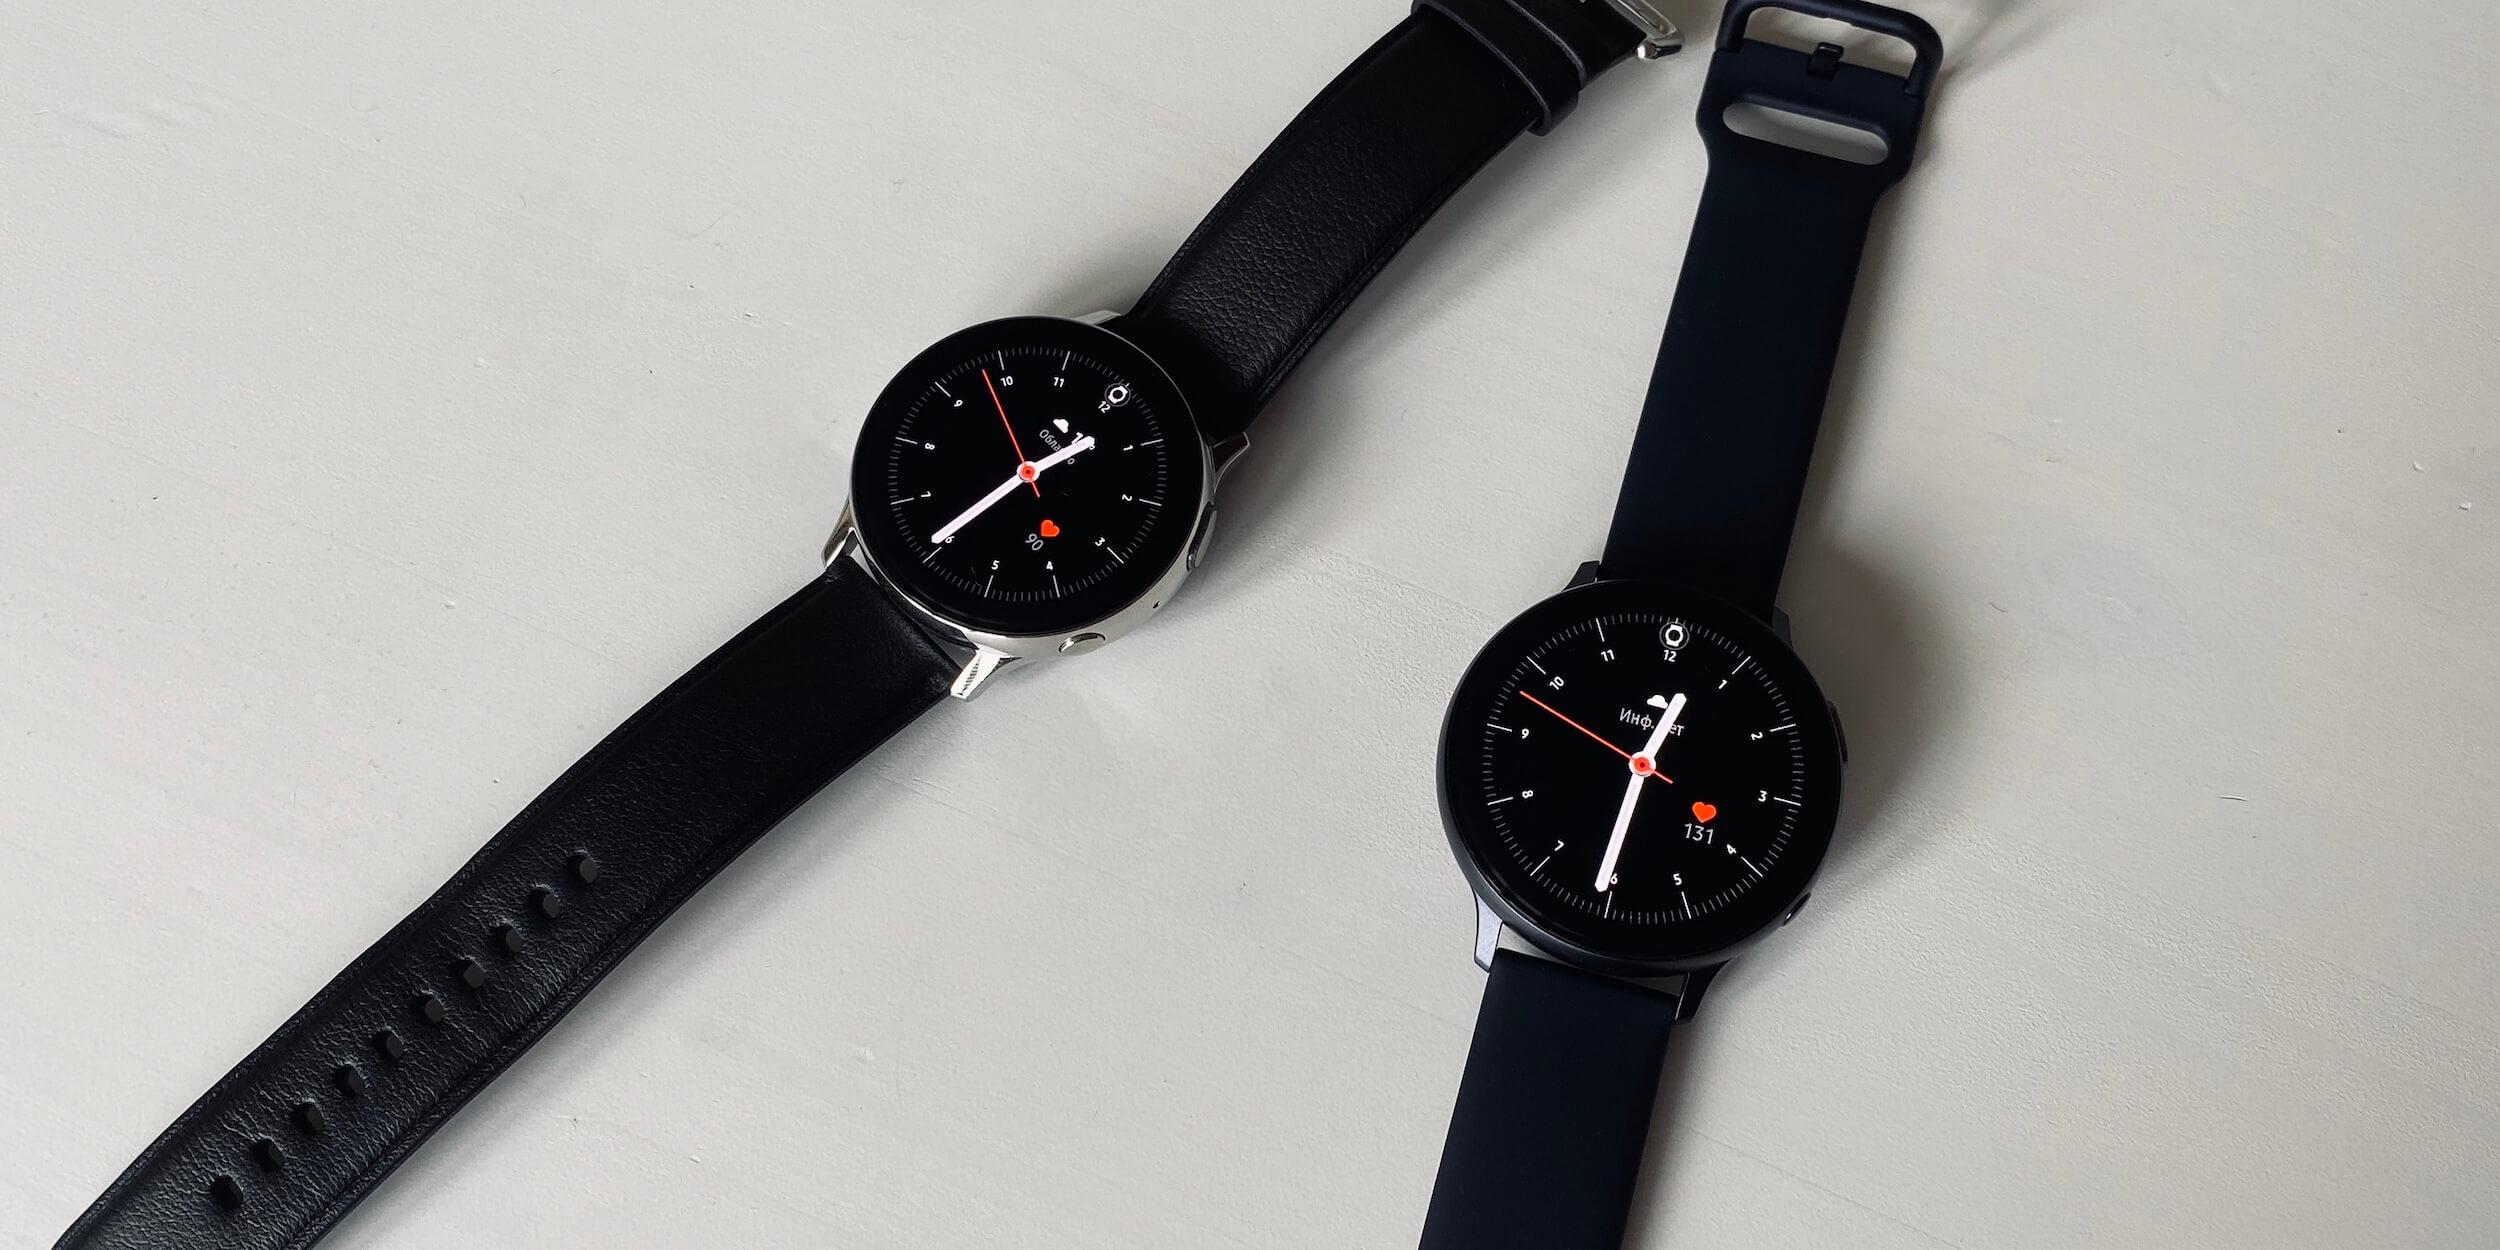 Samsung Galaxy Watch Active 2: итоги обзора